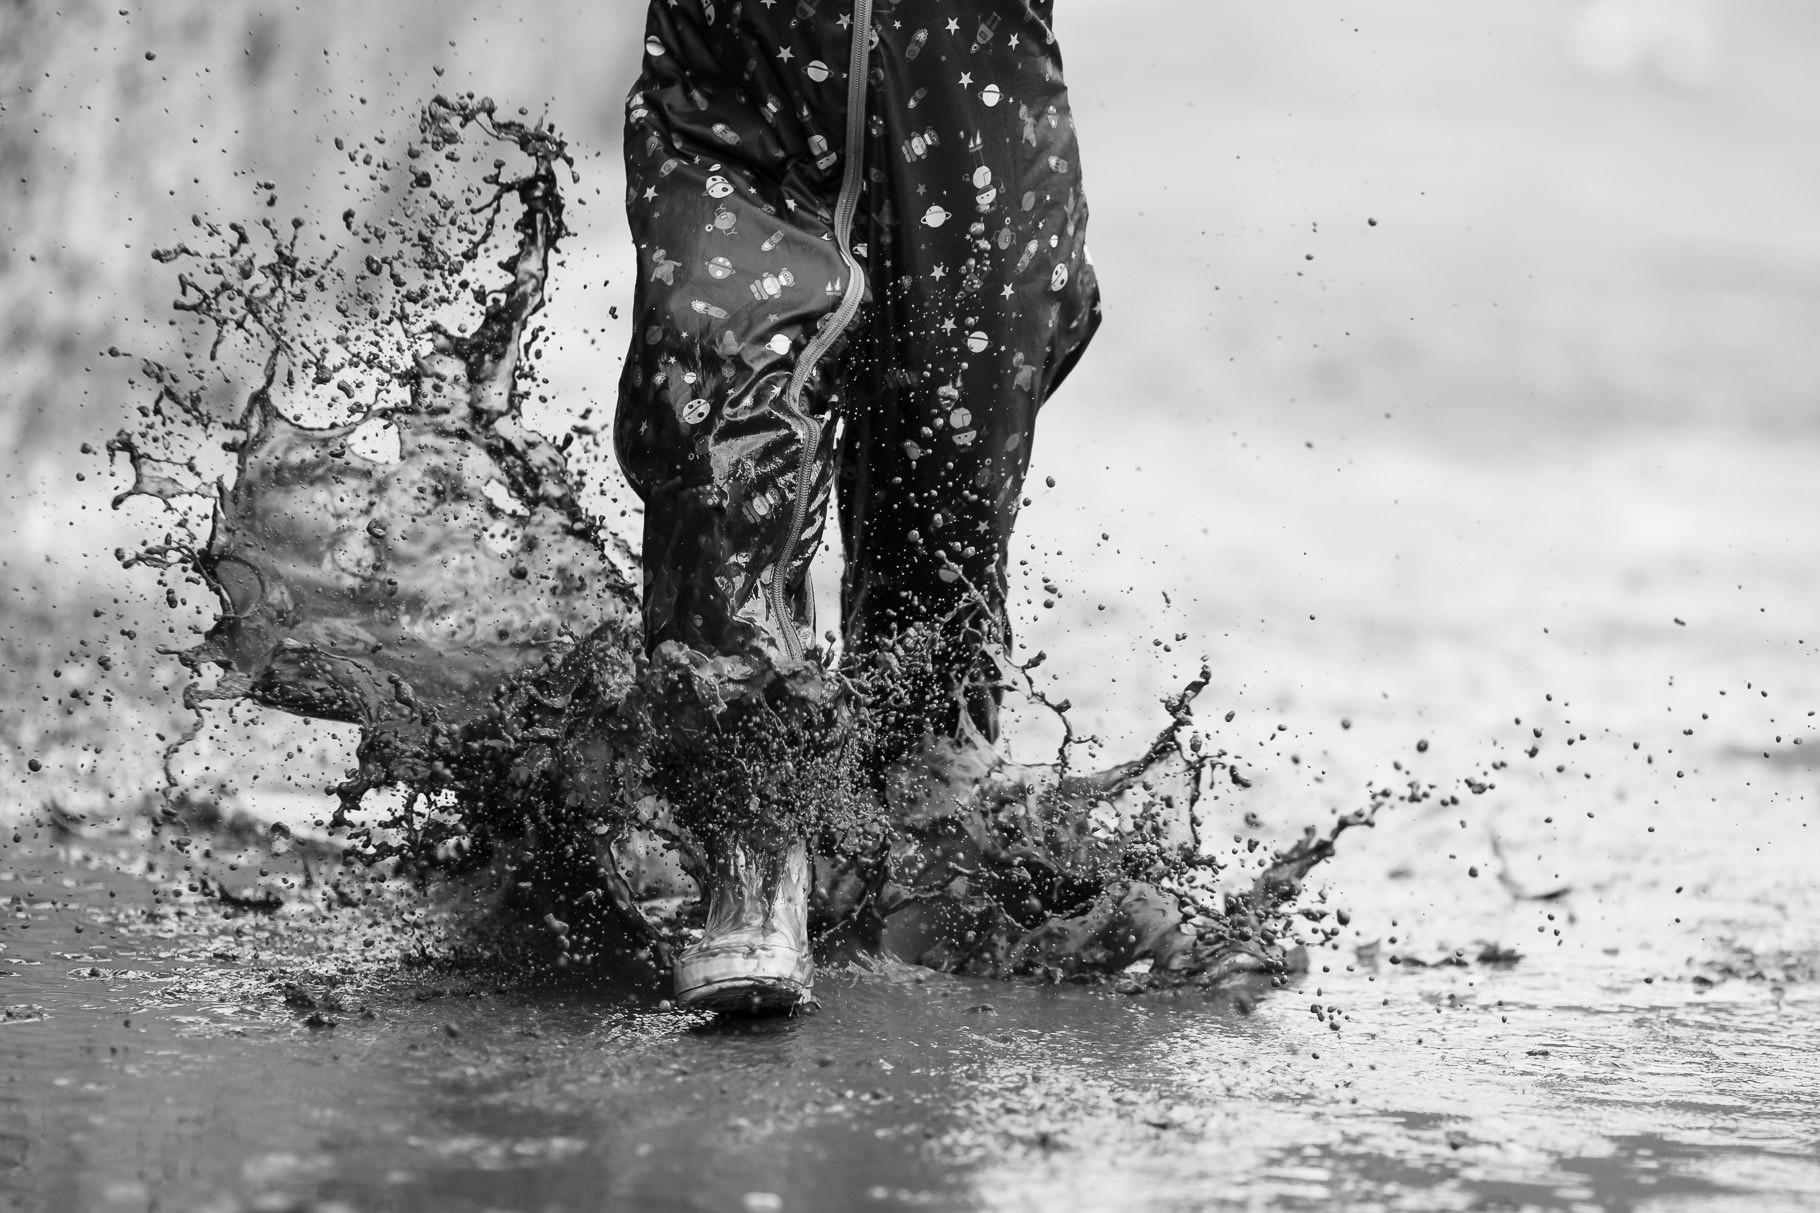 Big puddle splash at the Vyne National Trust in Basingstoke